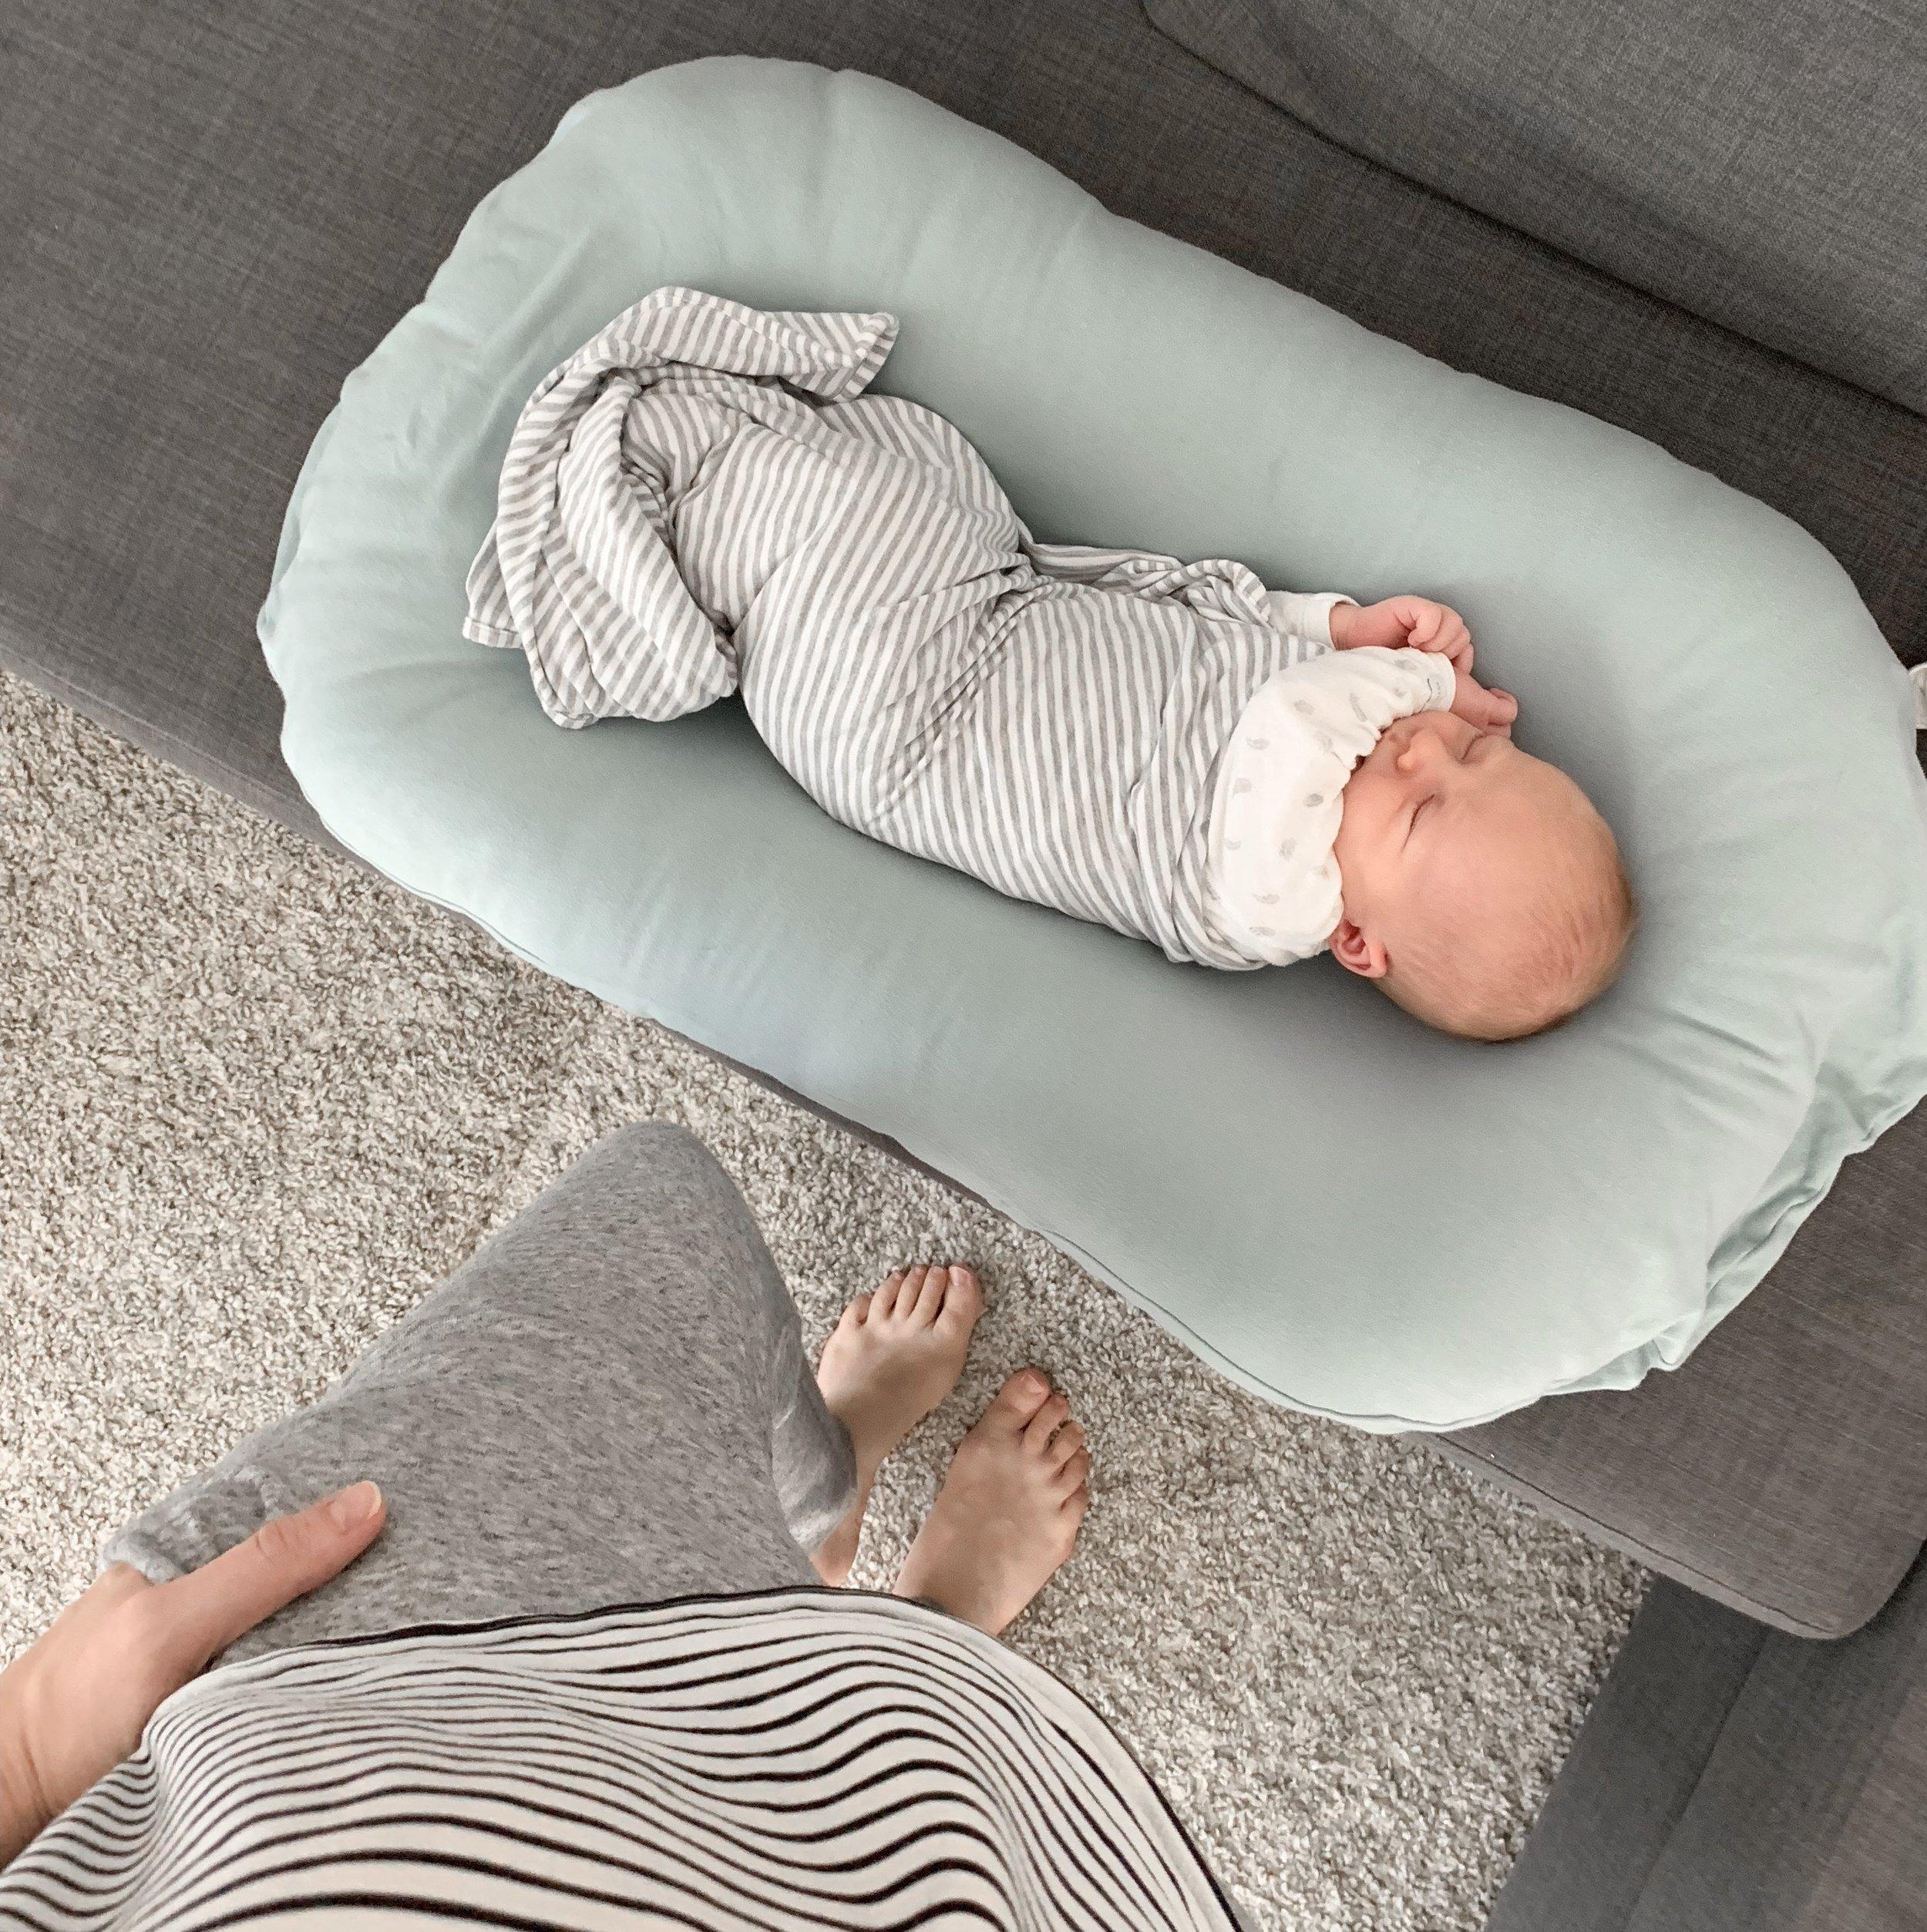 shardayengel-newbornbabyessentials2.JPG